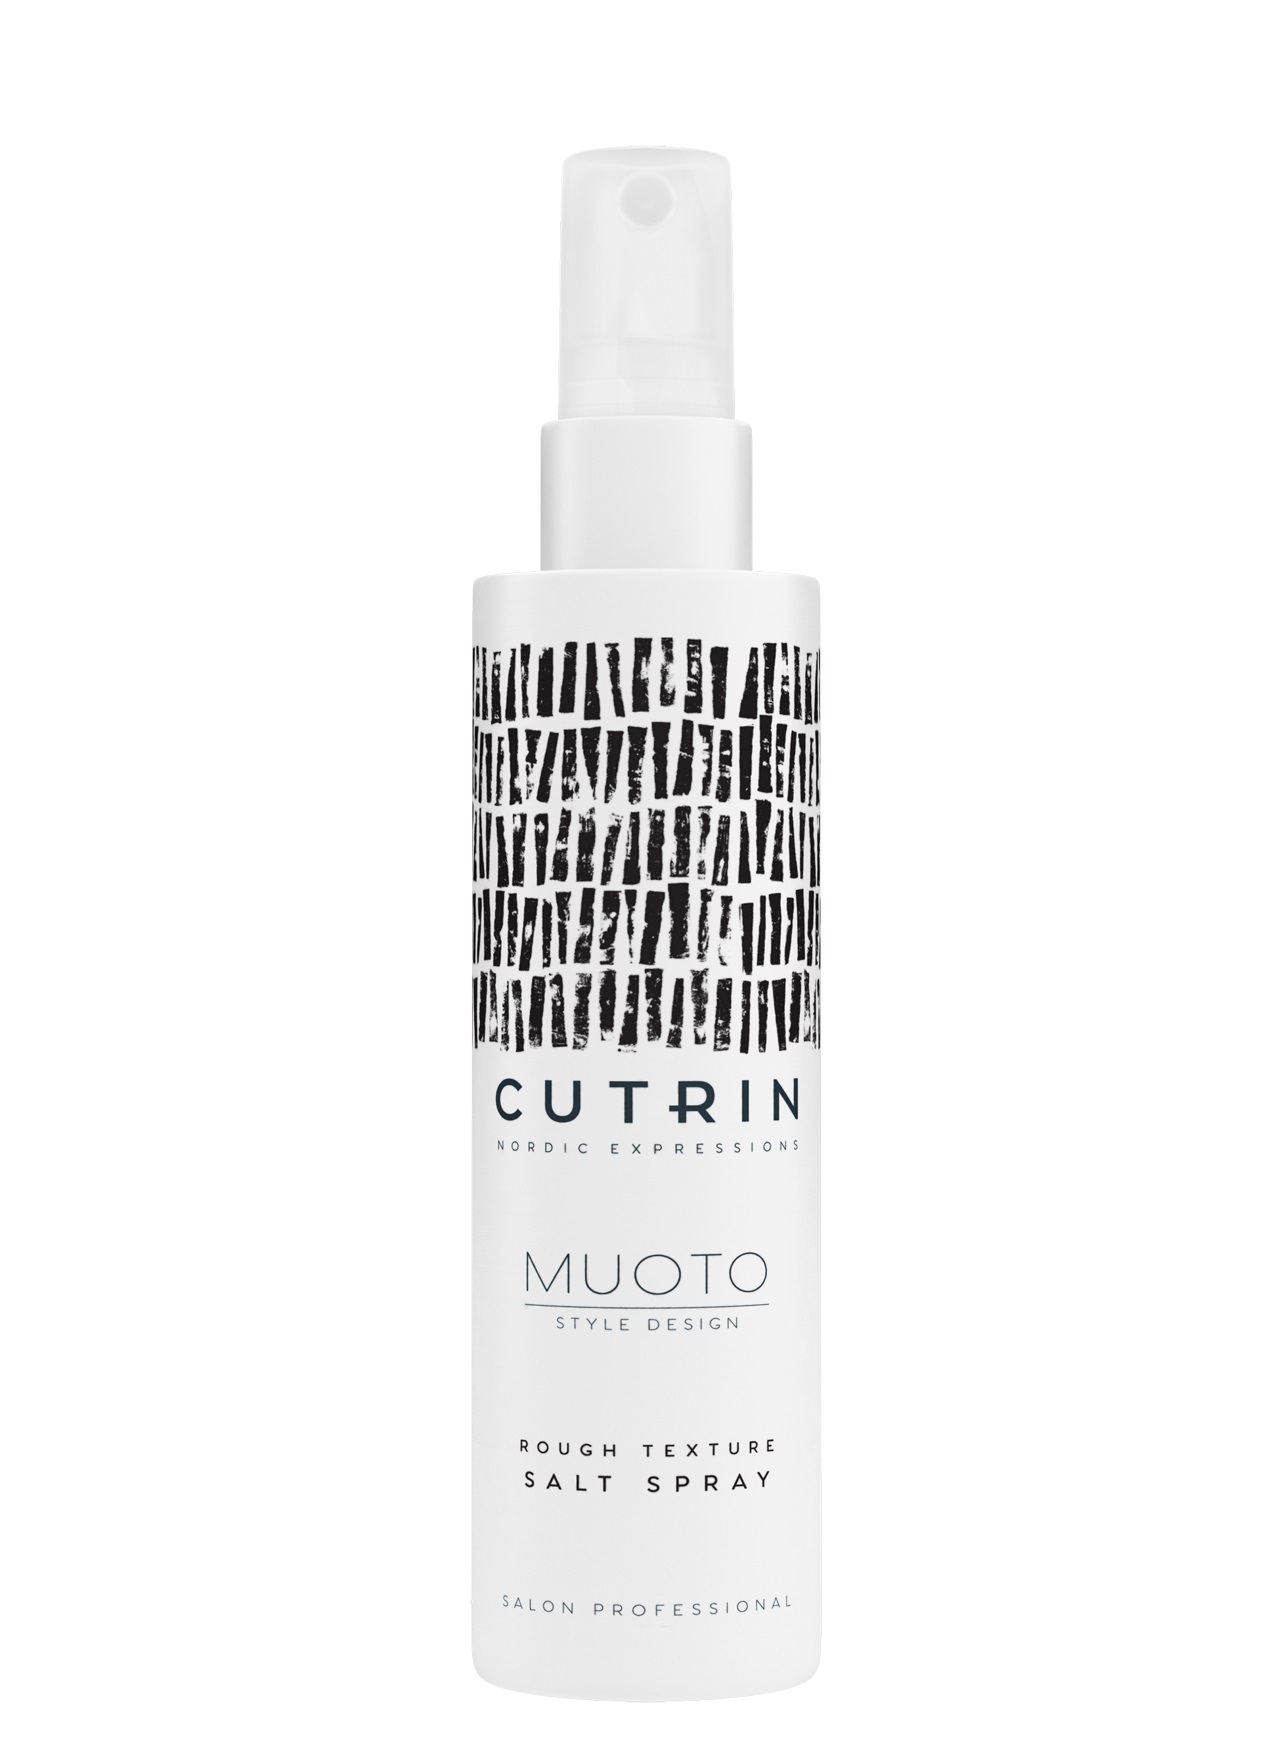 CUTRIN Спрей солевой для раф текстуры / MUOTO ROUGH TEXTURE SALT SPRAY 200 мл.